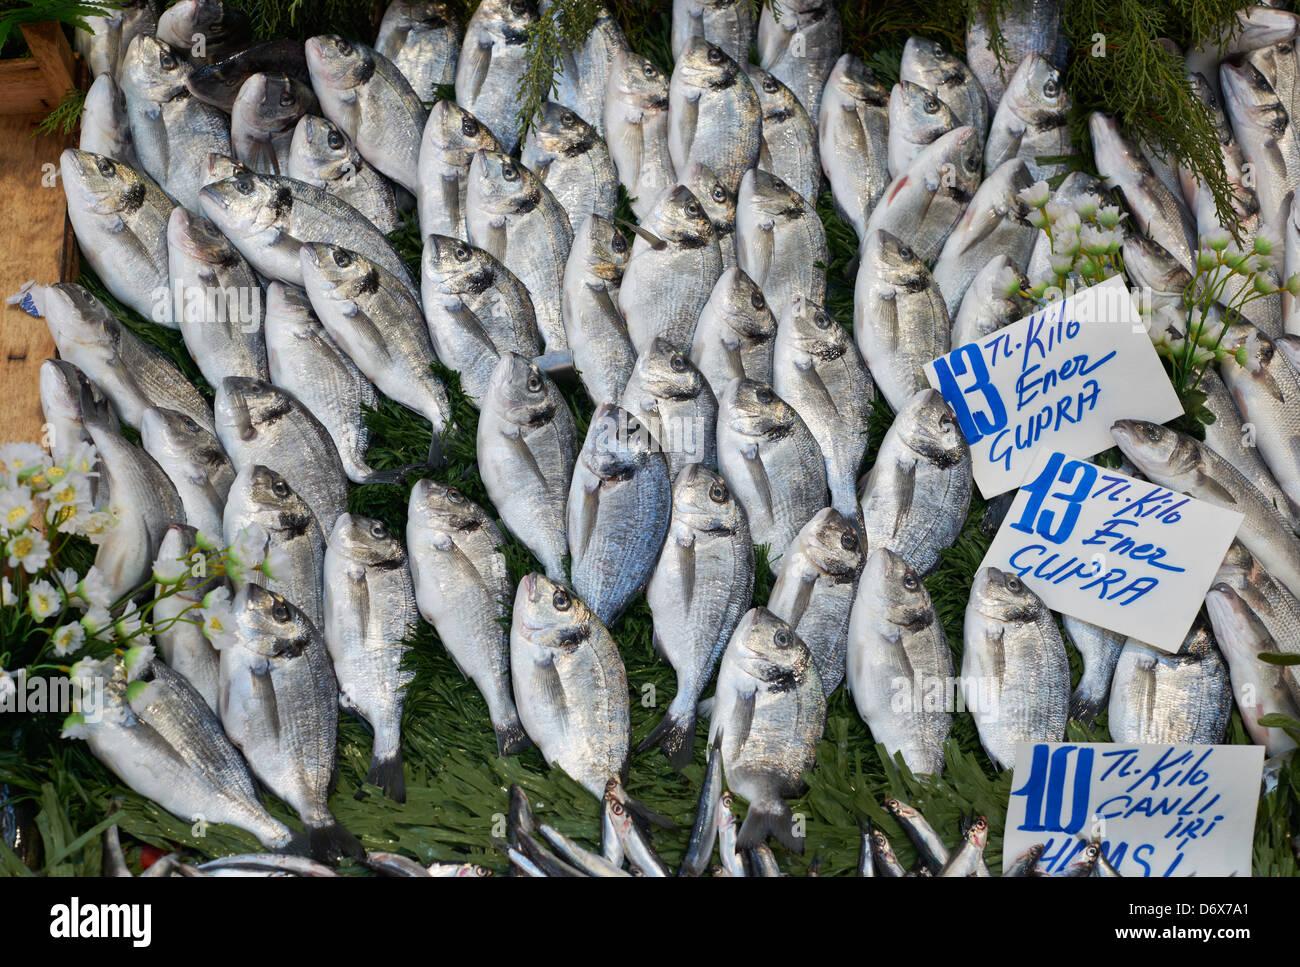 Fresh bream fish from the Mediterranean sea on the fish market in Edirne, turkey Stock Photo